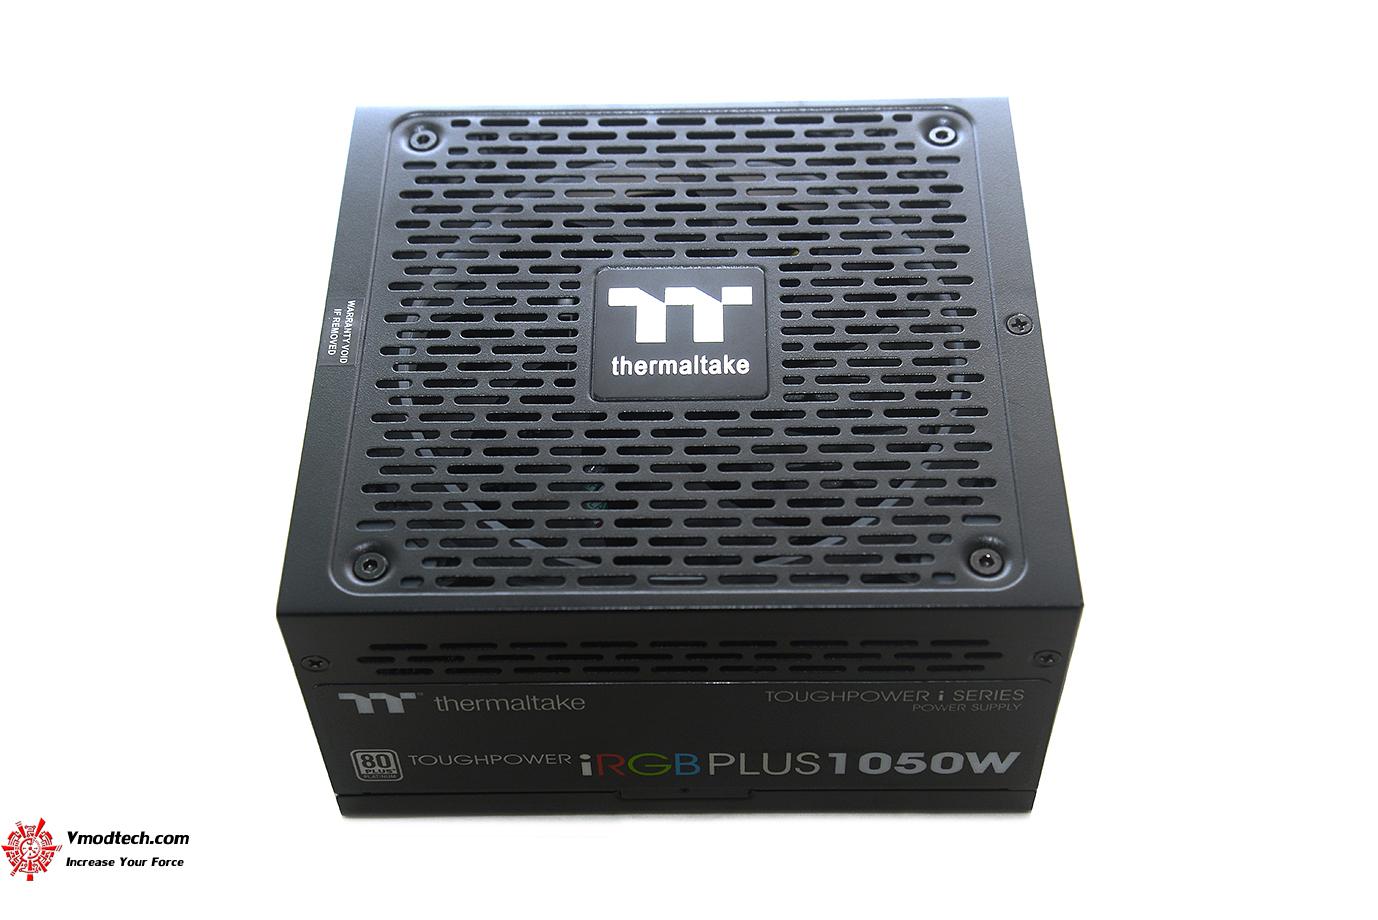 dsc 1457 Thermaltake Toughpower iRGB PLUS 1050W Platinum Review